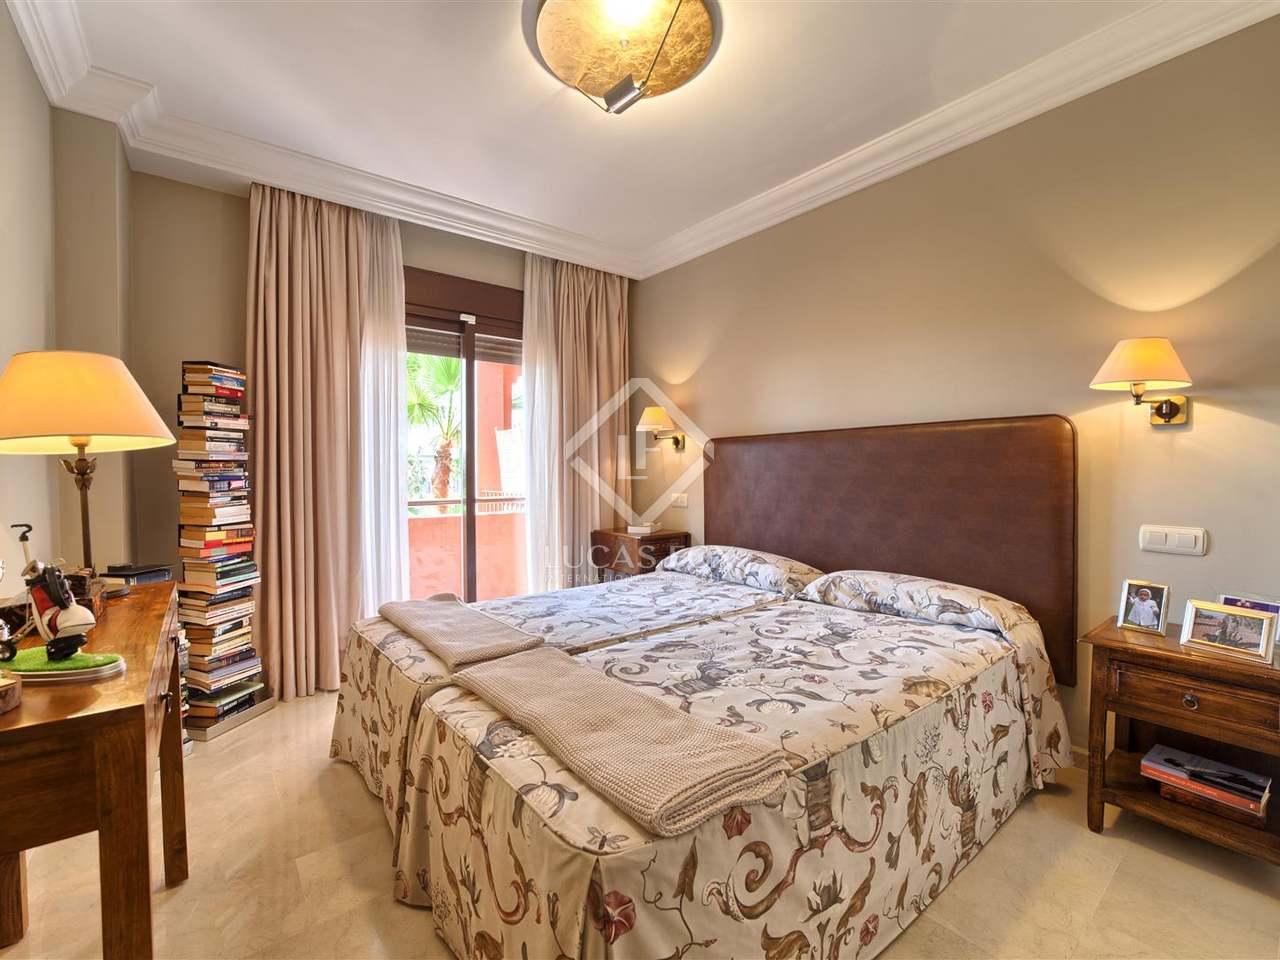 3 Bedroom First Floor Apartment For Sale Near Puerto Banus